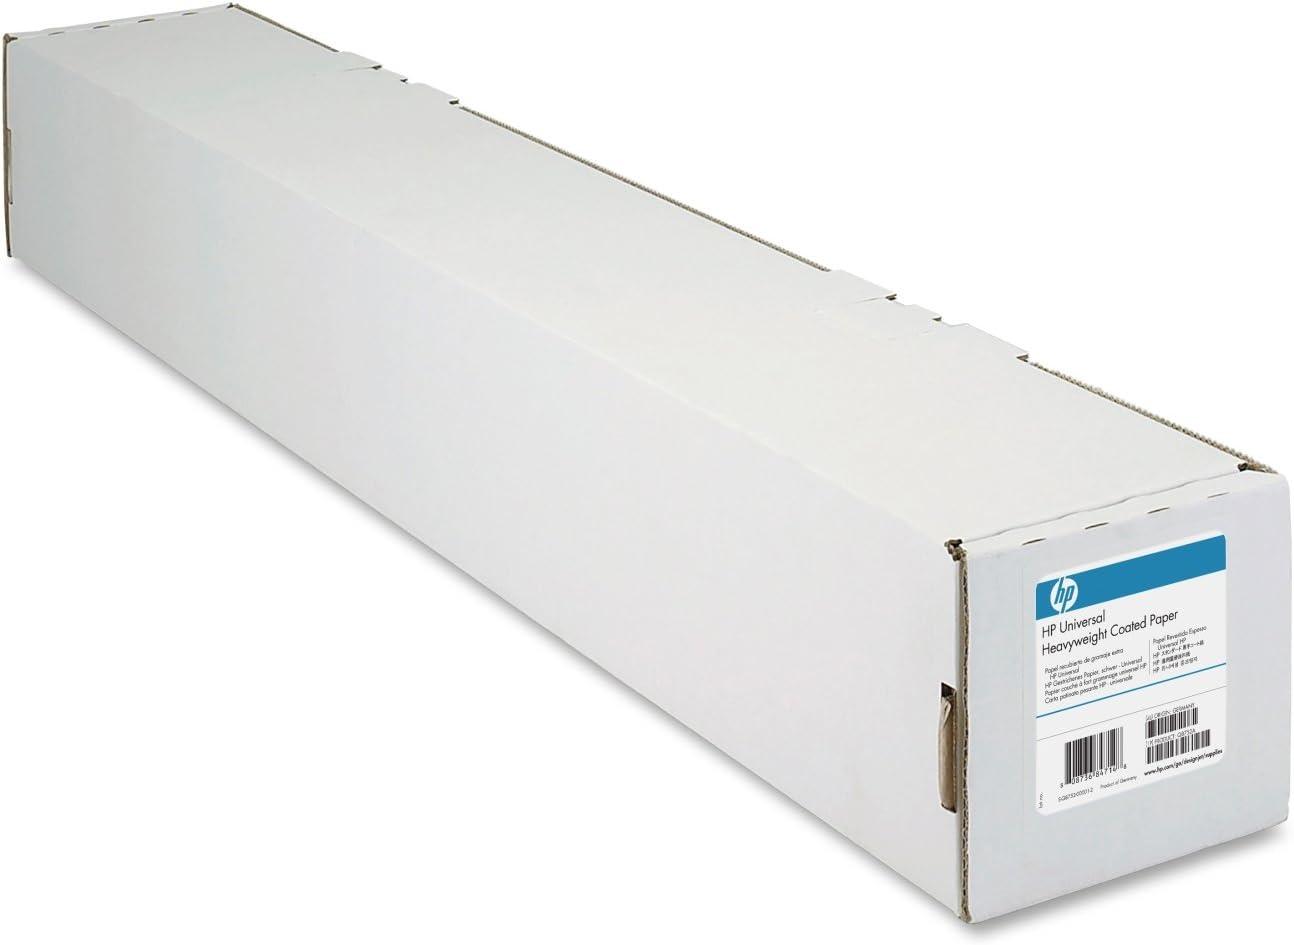 "HP Universal Heavyweight Coated Paper 6.8 mil, 131 g/m2 (35lbs), 2"" core, 1 roll/carton (42"" x 100')"